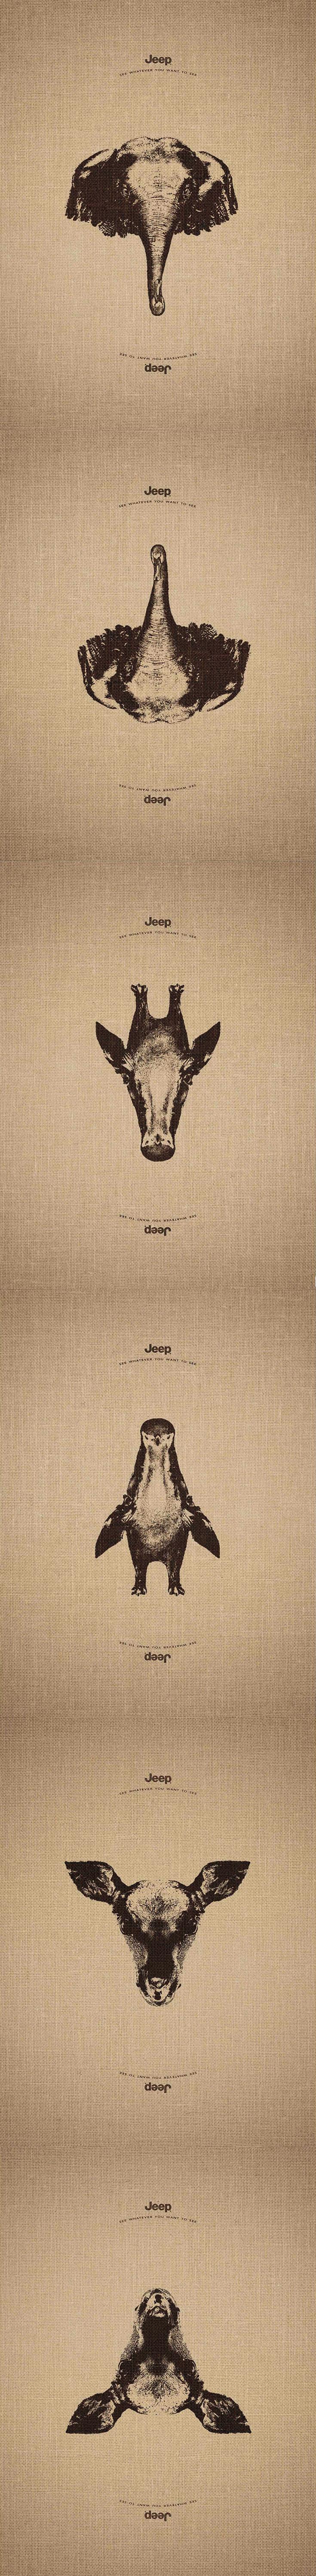 #Brand: #Jeep See whatever you want to see. #Advertising Agency: Leo Burnett, France #ads #creative #creativity #pub #publicité #leoburnett